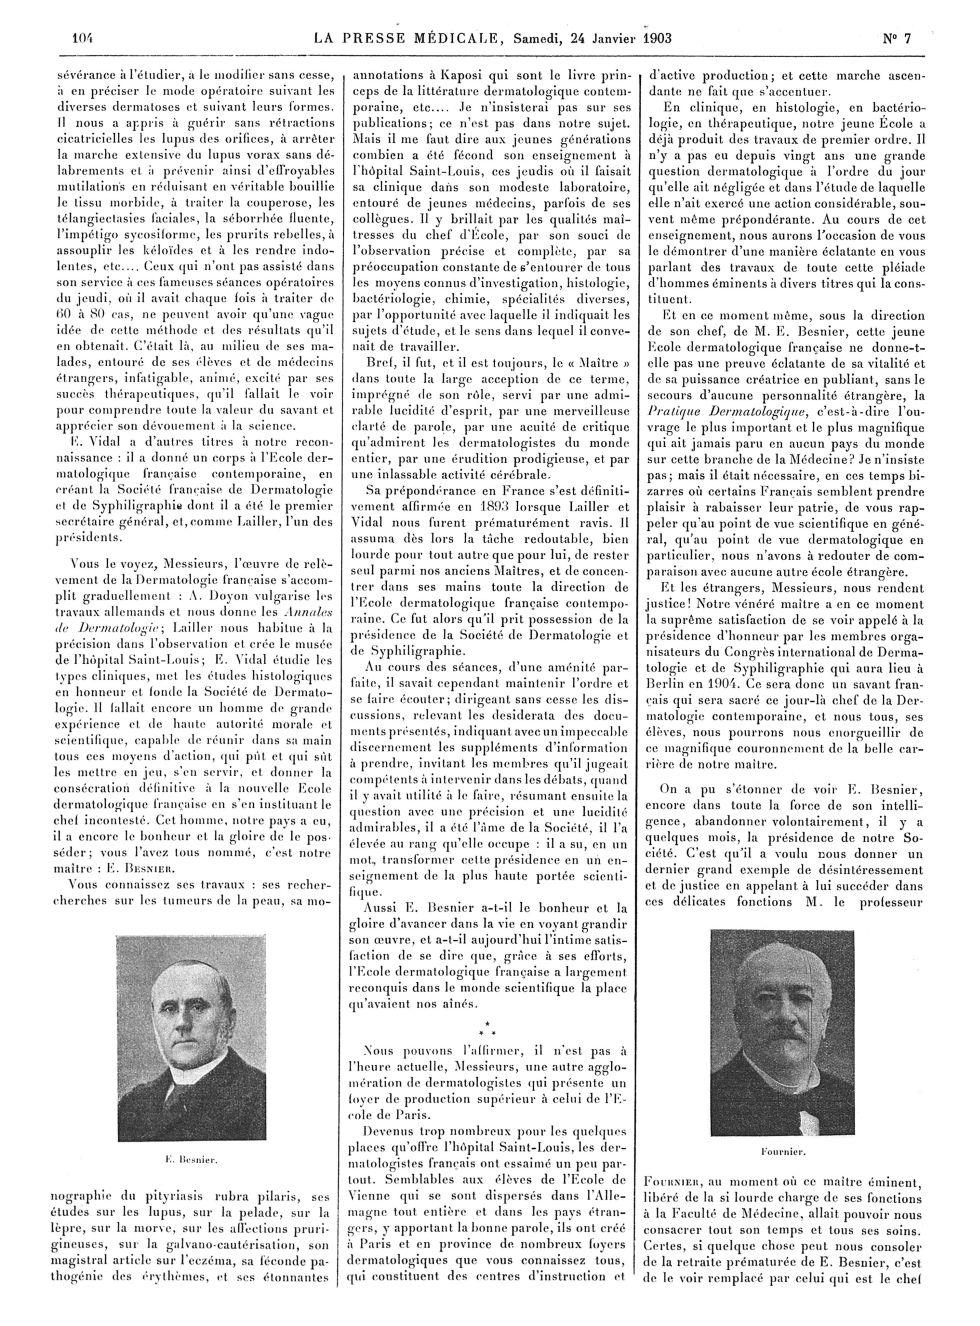 E. Beier / Fournier - La Presse médicale - [Articles originaux] -  - med100000x1903xartorigx0106